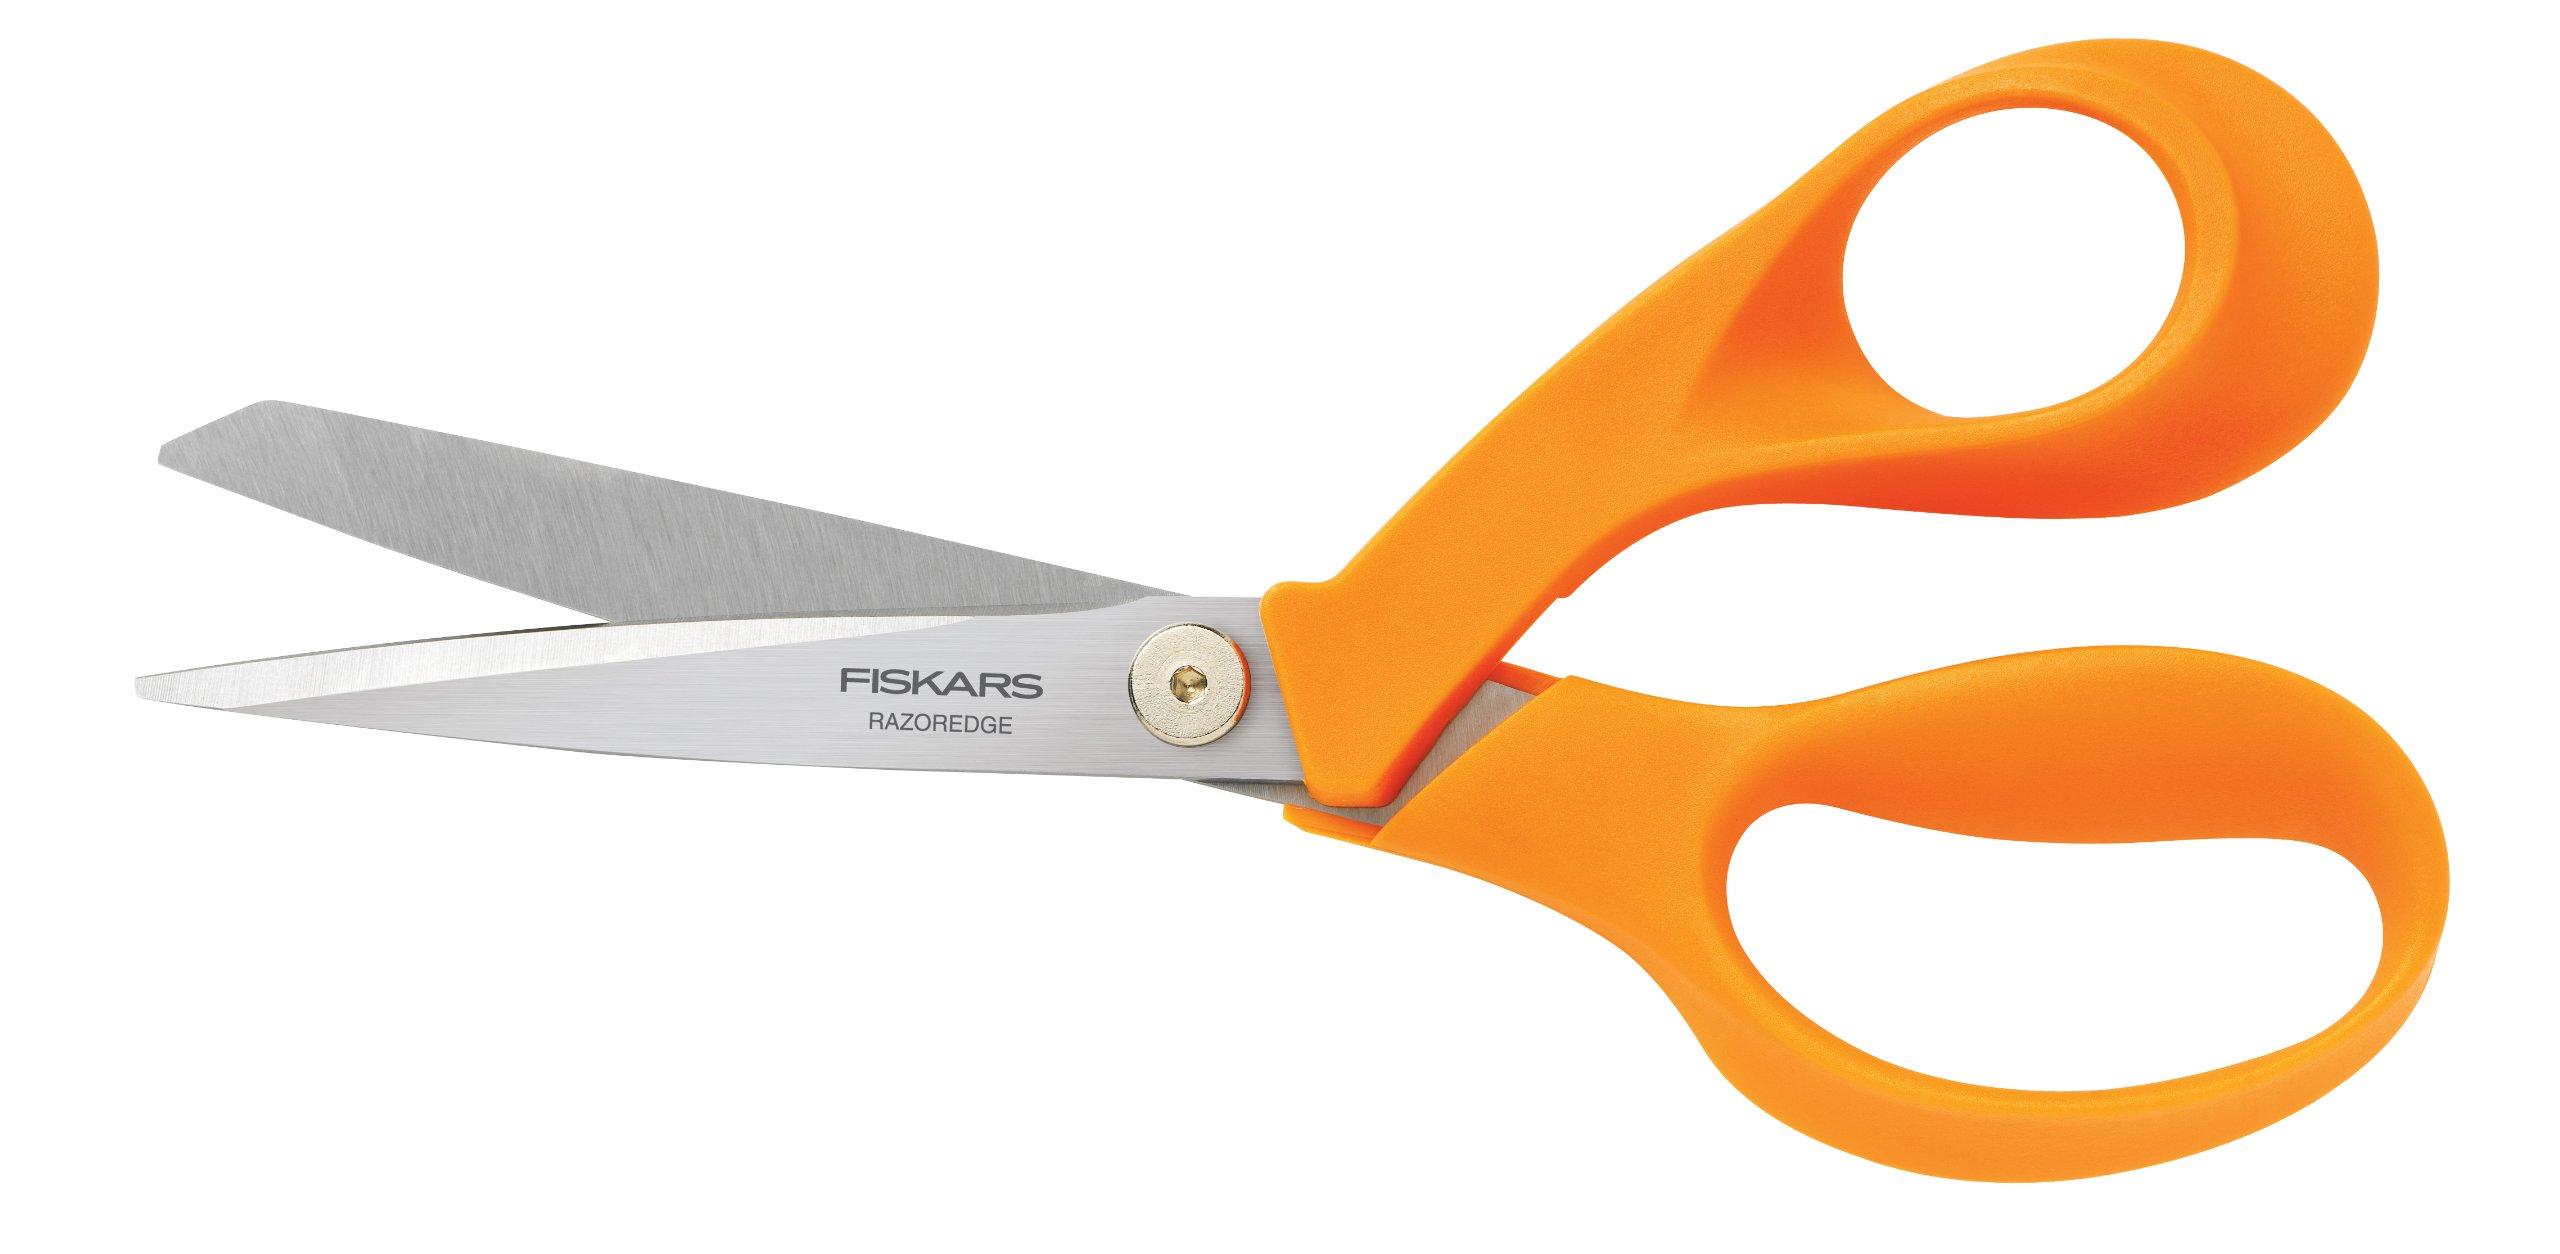 Tijera : Fiskars Crafts 8180 Razoredge Fabric Shears, 8-i..